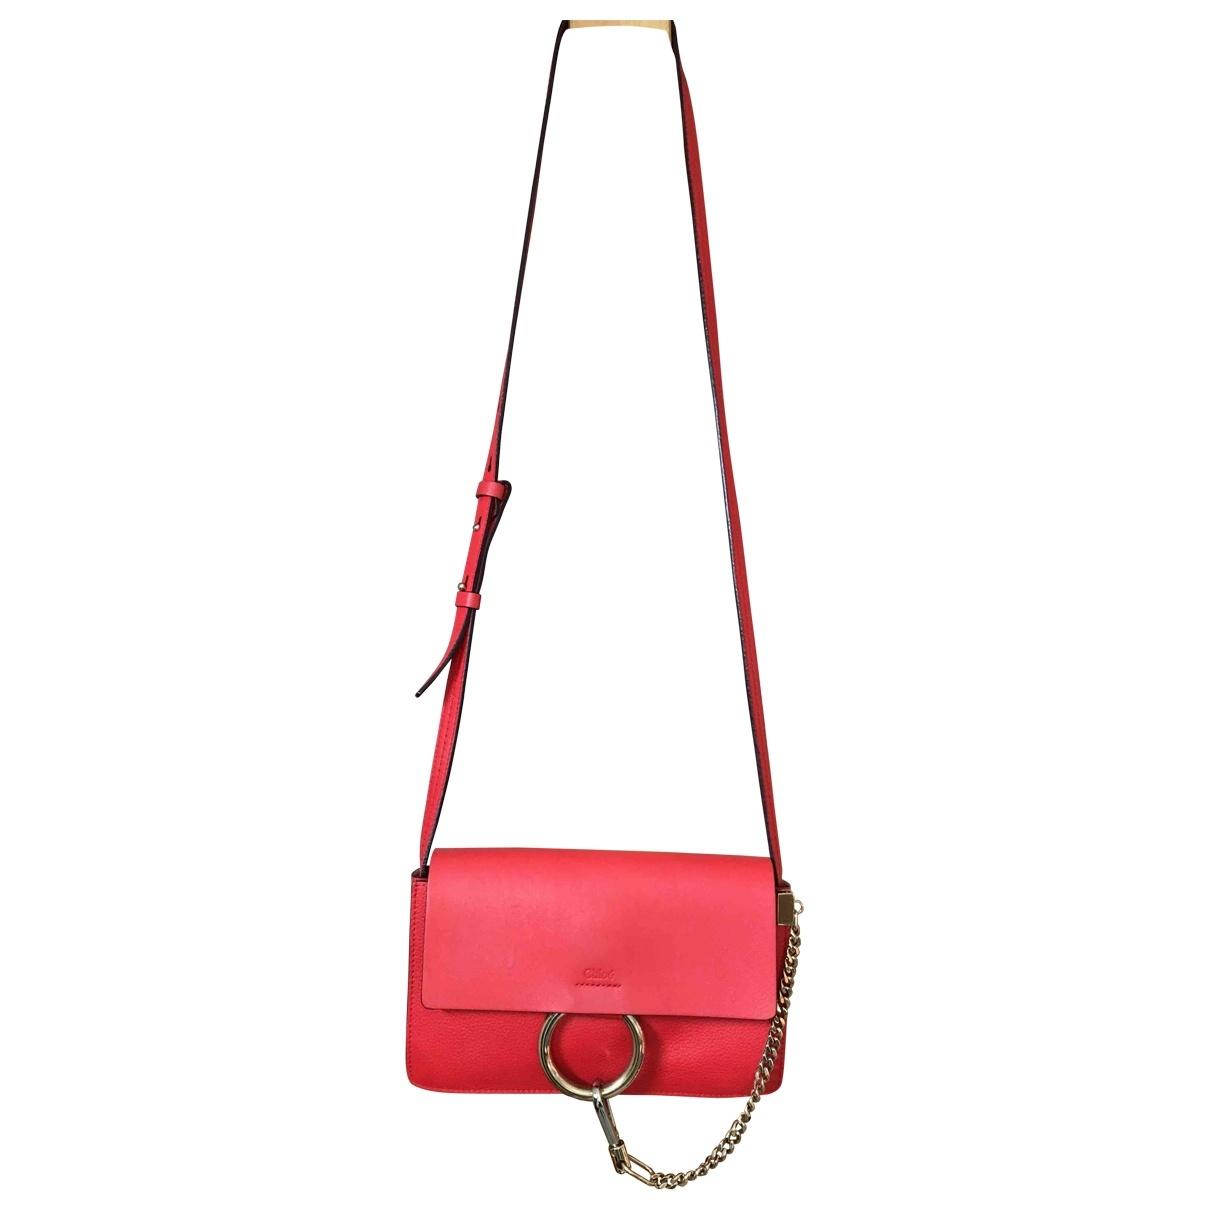 Chloe Faye Handtasche in  Rot Leder